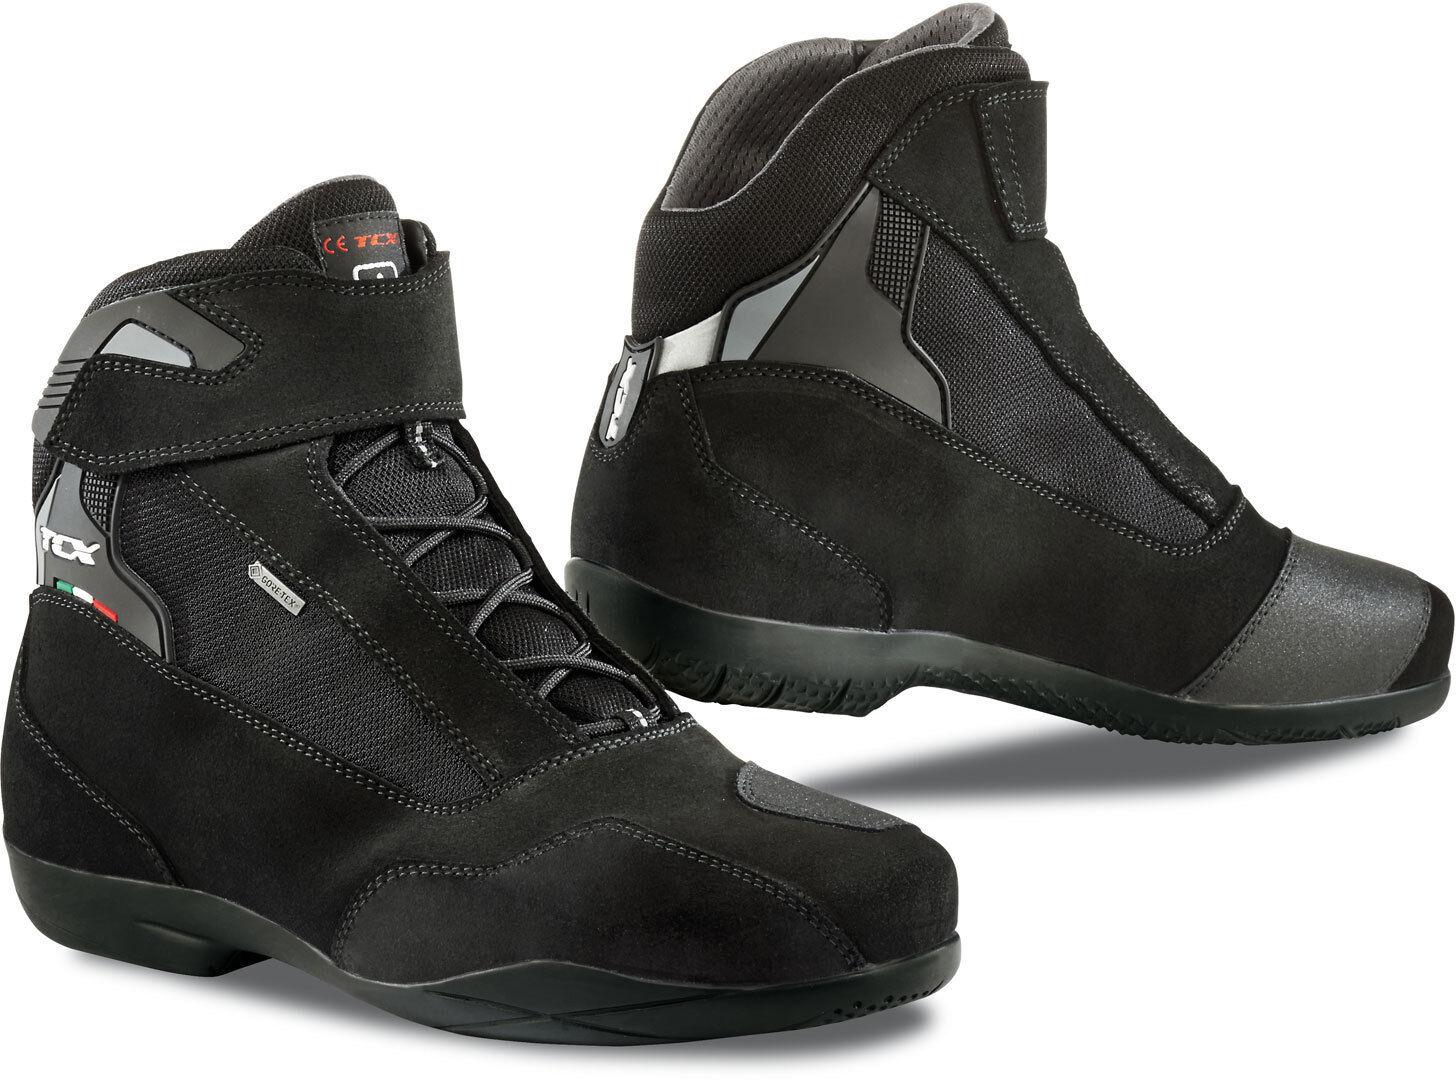 TCX Jupiter 4 Gore-Tex Chaussures de moto Noir taille : 41